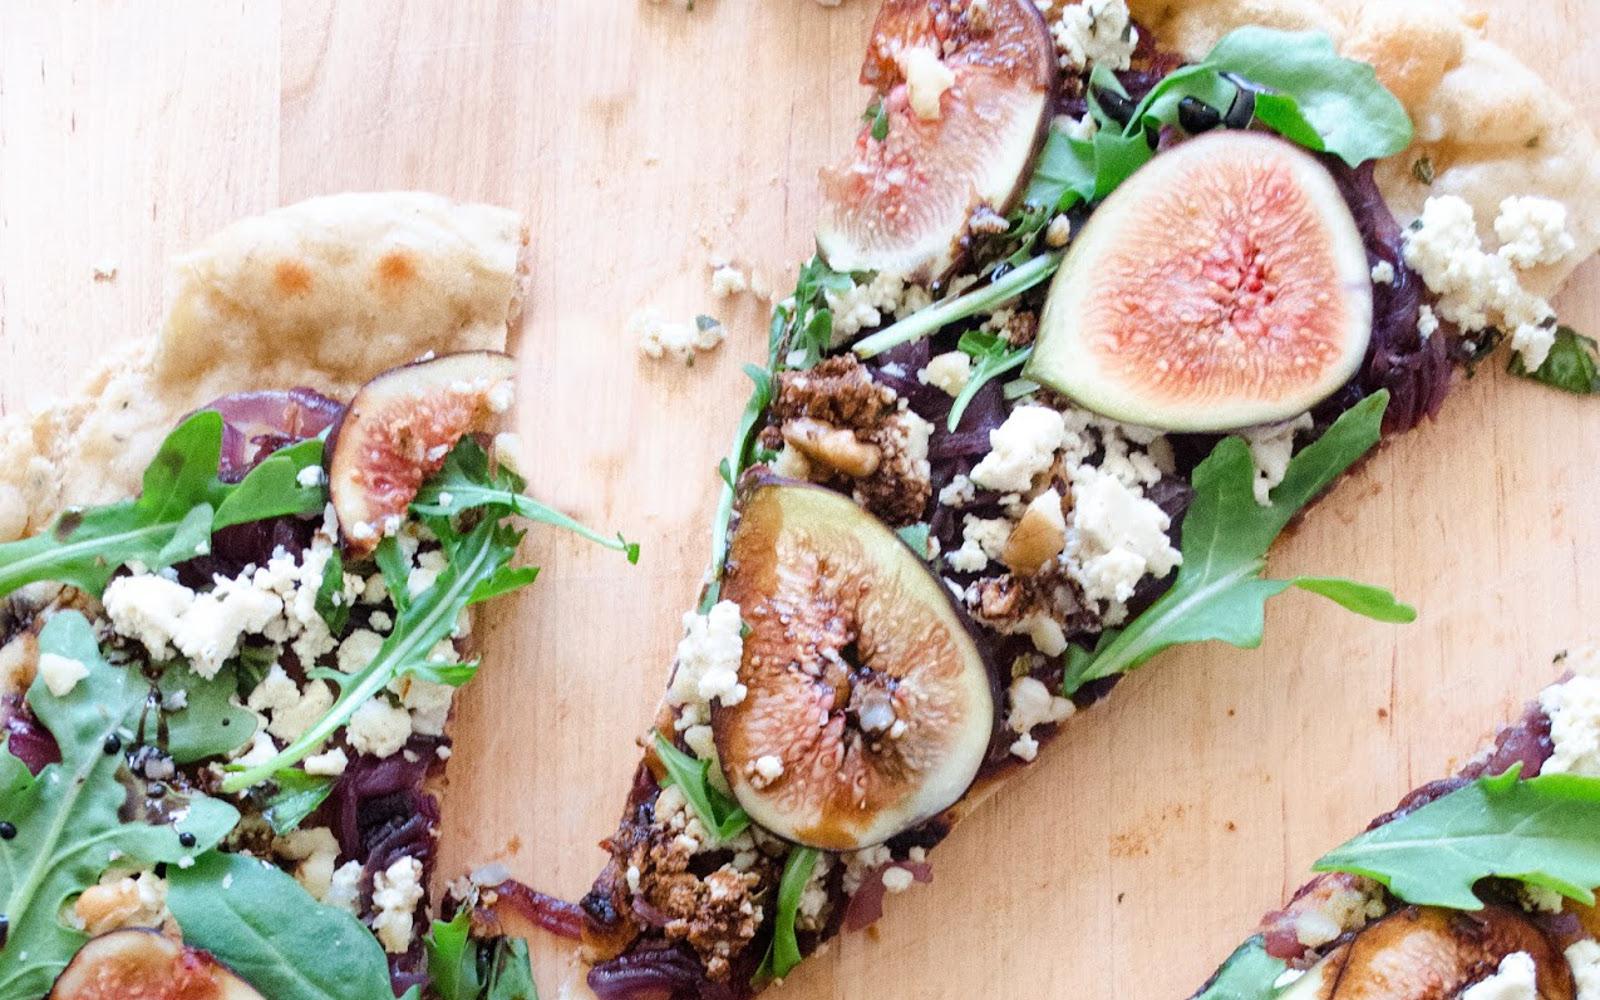 Fig, Ricotta, and Caramelized Onion Flatbread